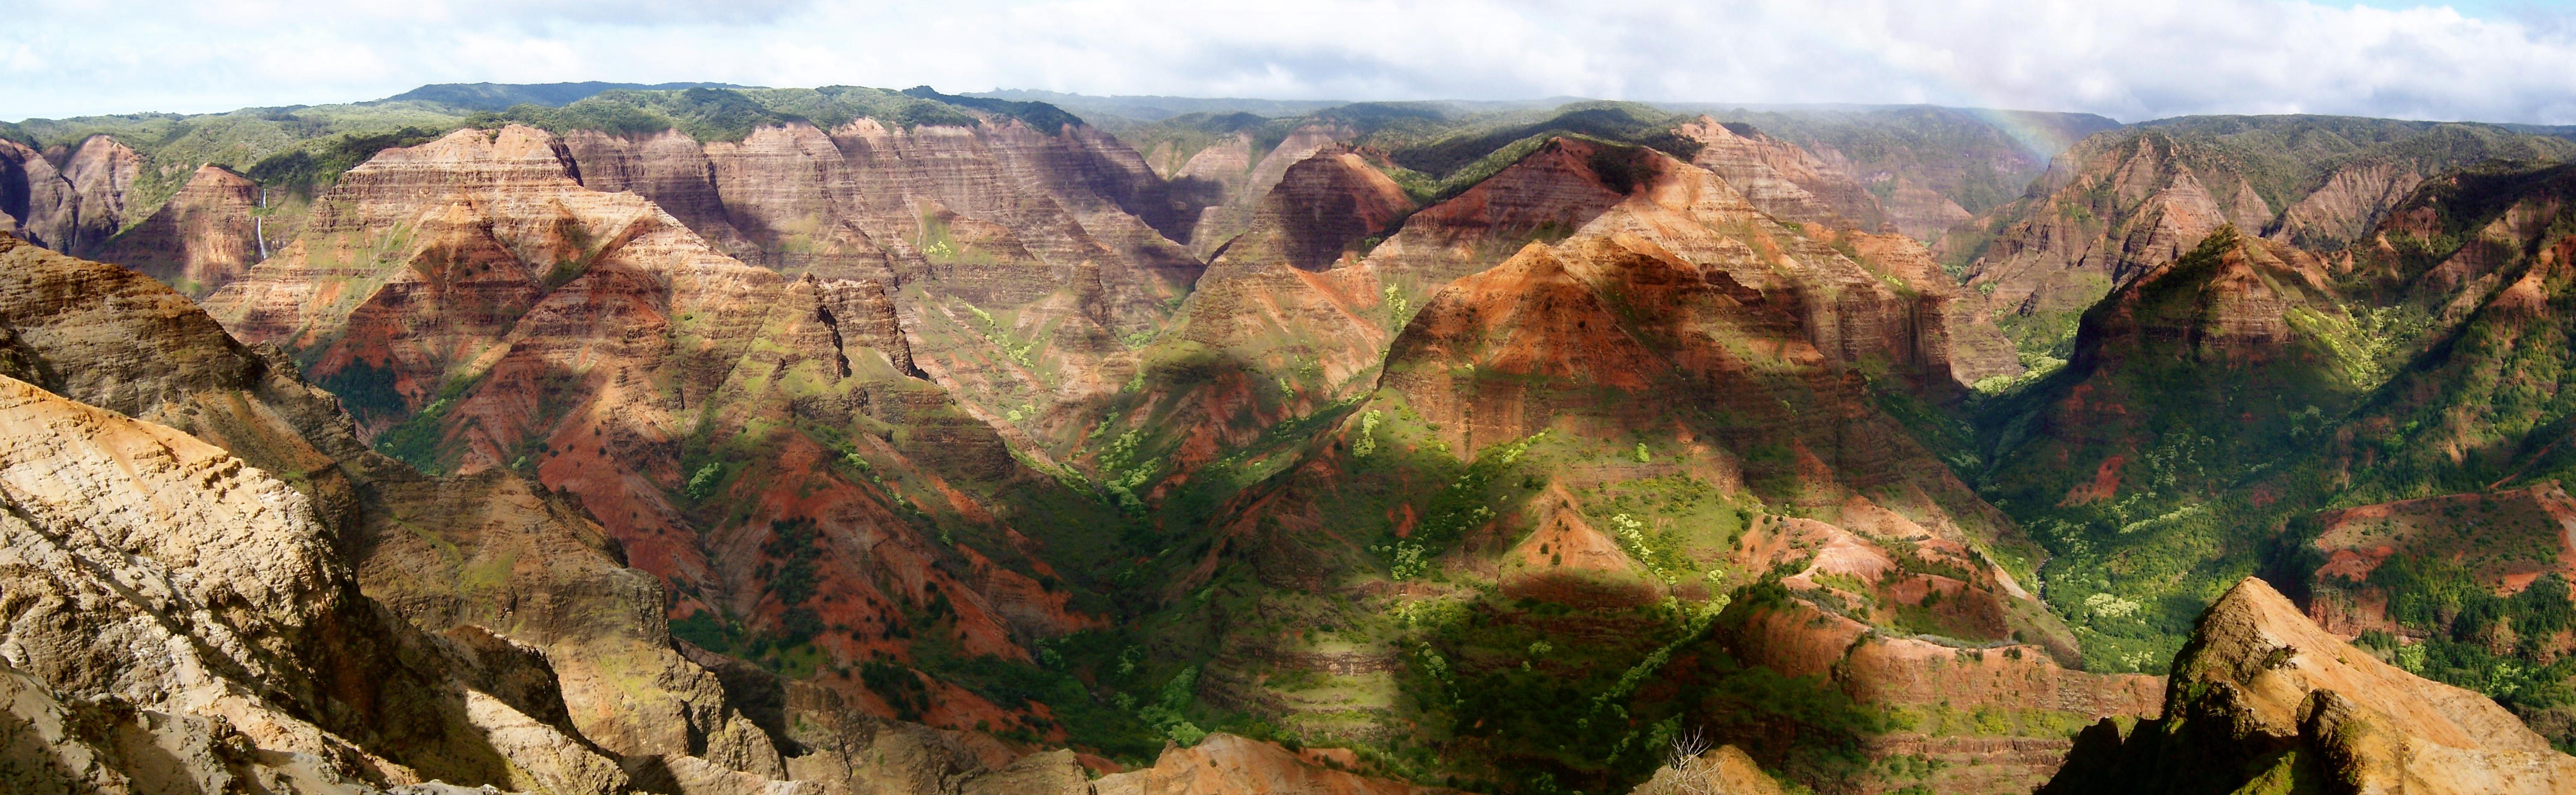 Kauai: Sightseeing